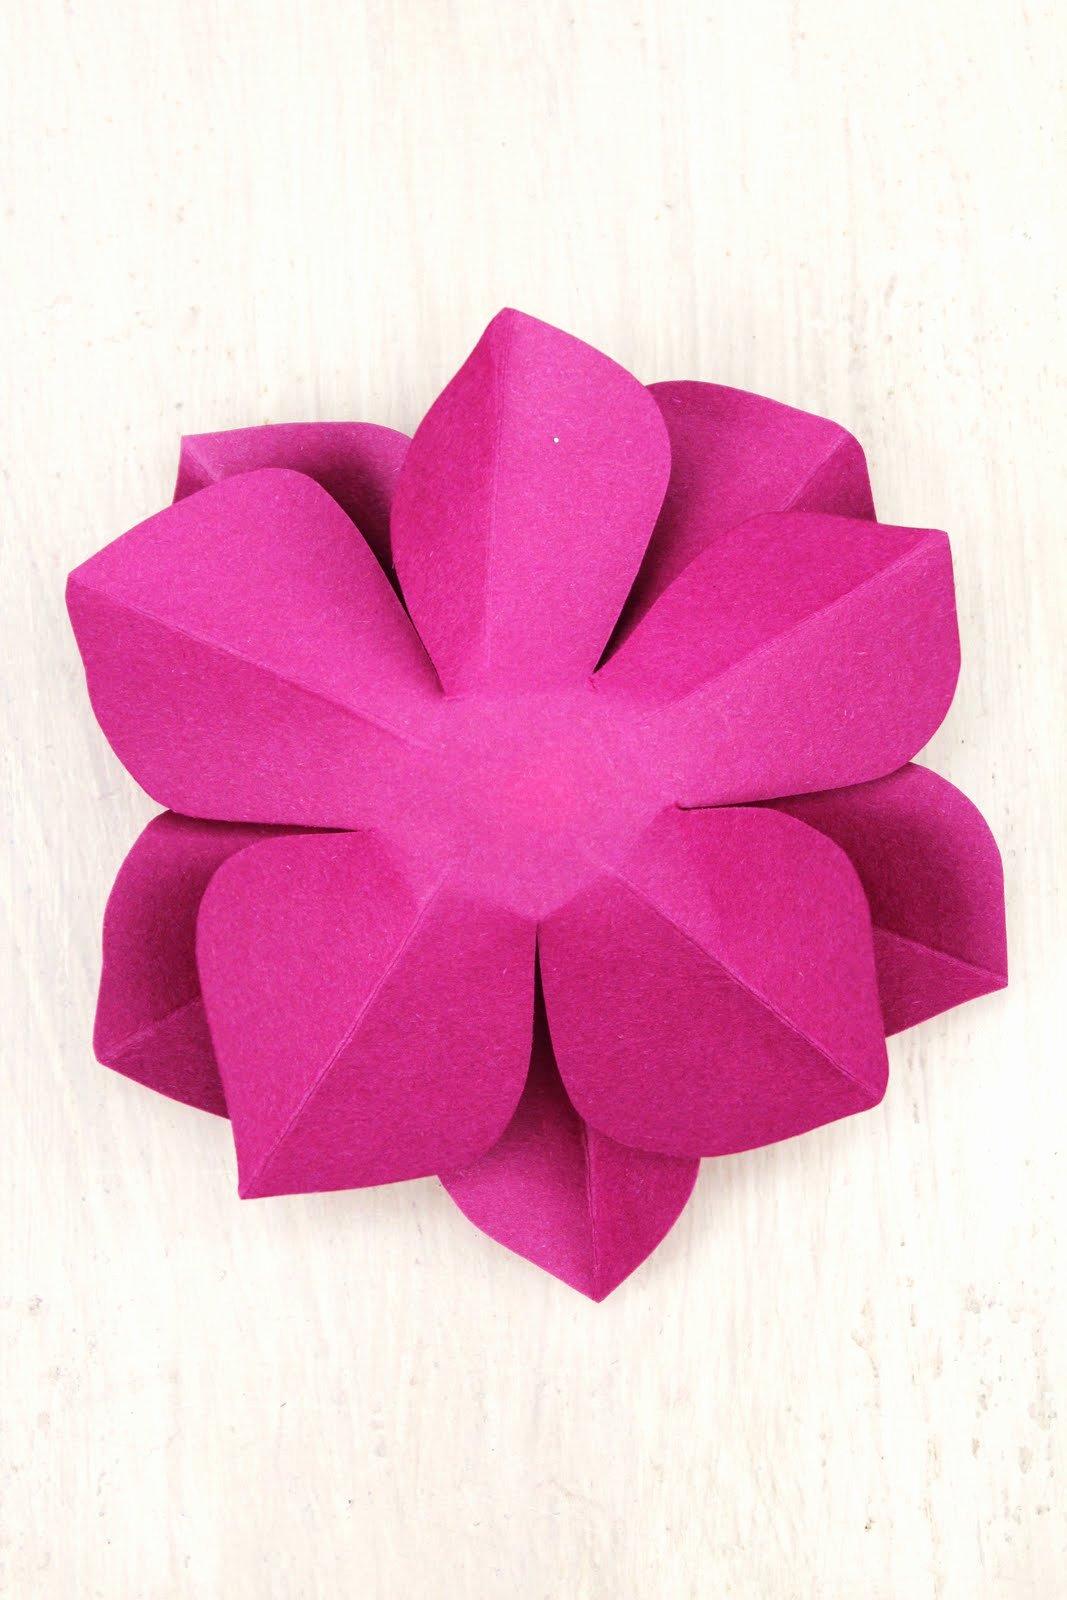 Diy Paper Flower Template New Icing Designs Diy Paper Flowers